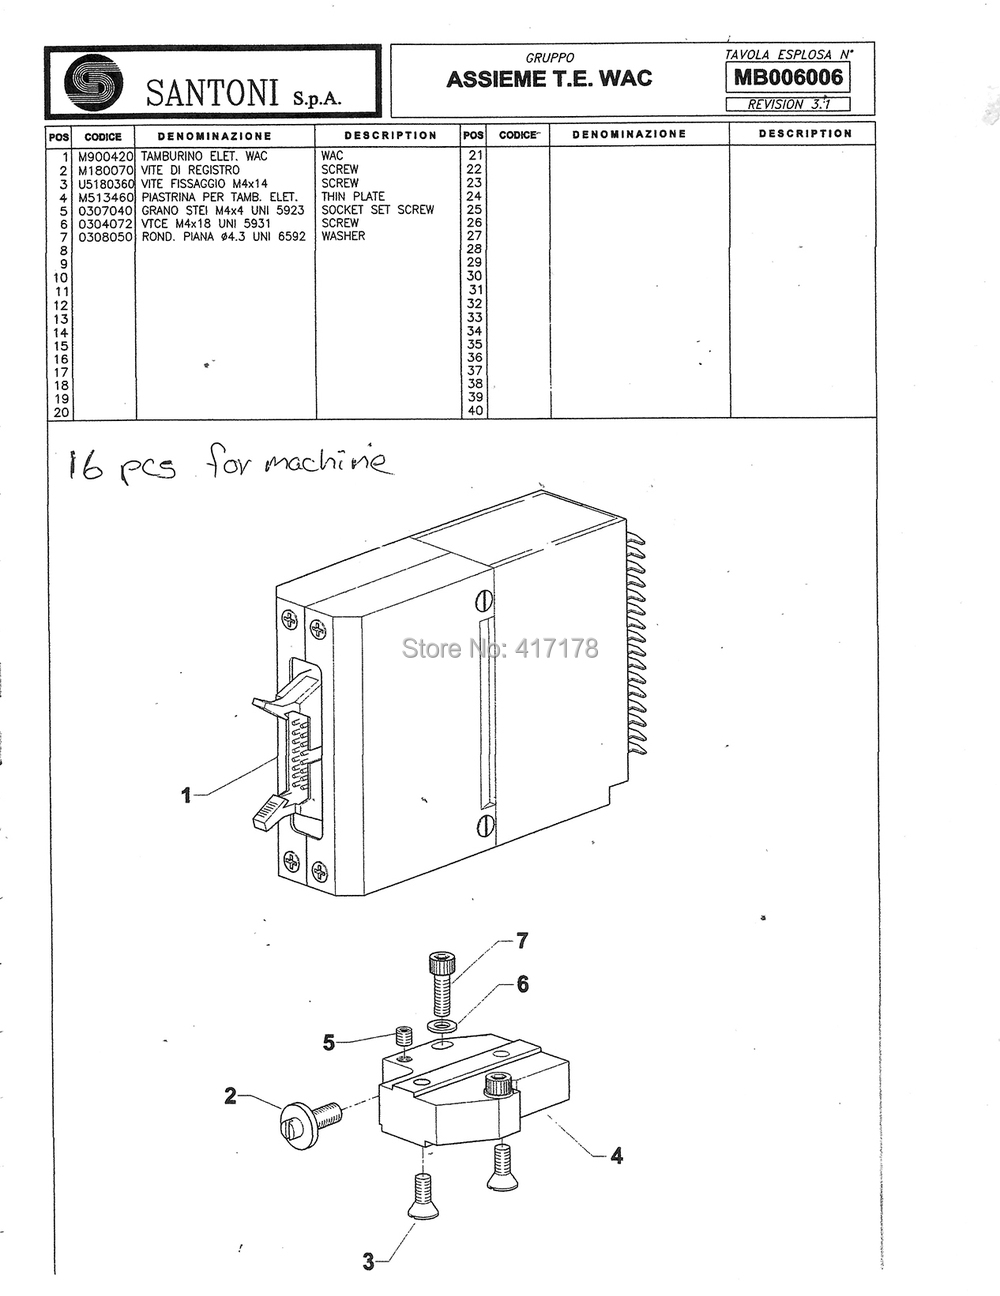 Santoni Seamless Underwear Machine Sm8 Top1 Top2 Use Wac Transformer Wiring Diagrams Getsubject Aeproductgetsubject